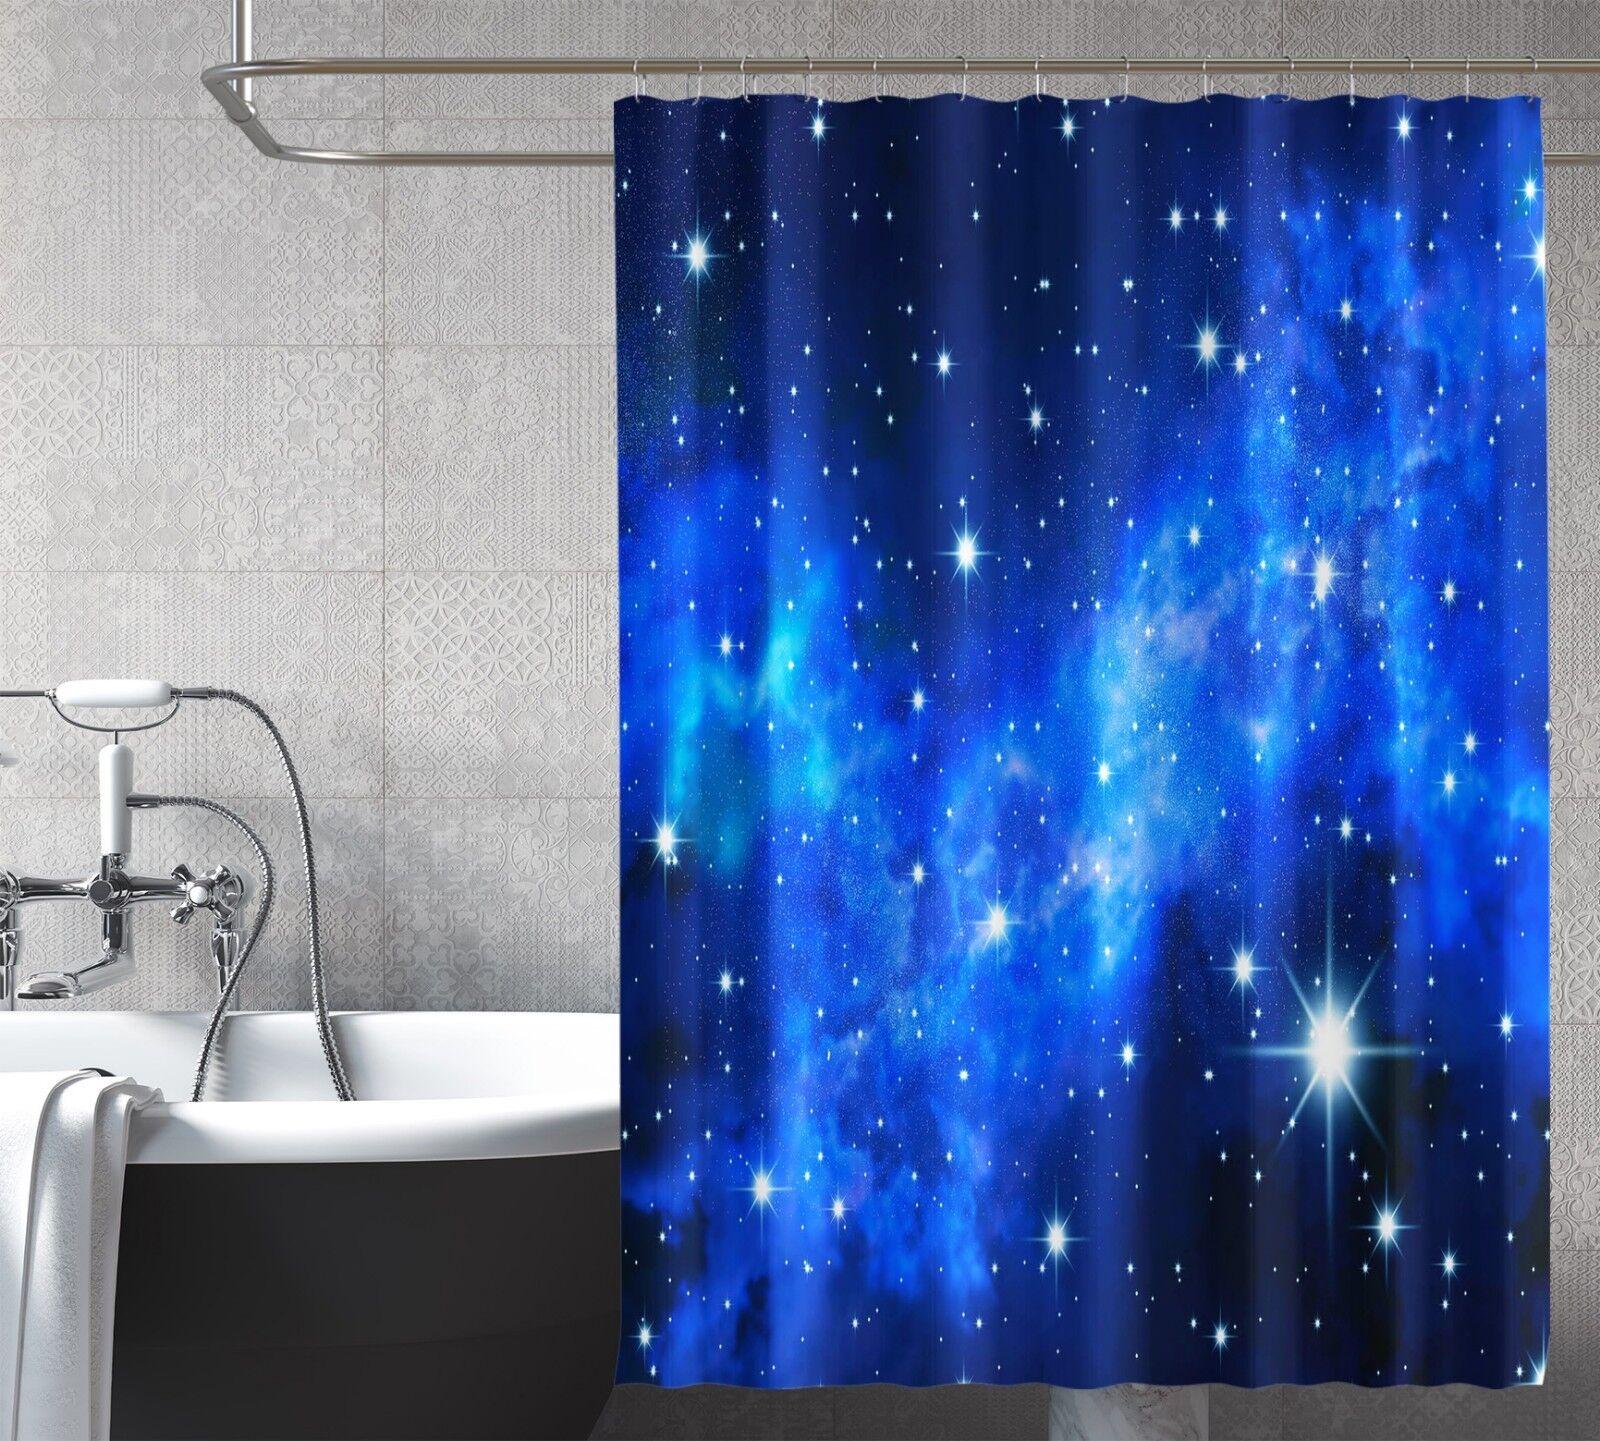 3D Blau Galaxy 79 Shower Curtain Waterproof Fiber Bathroom Home Windows Toilet